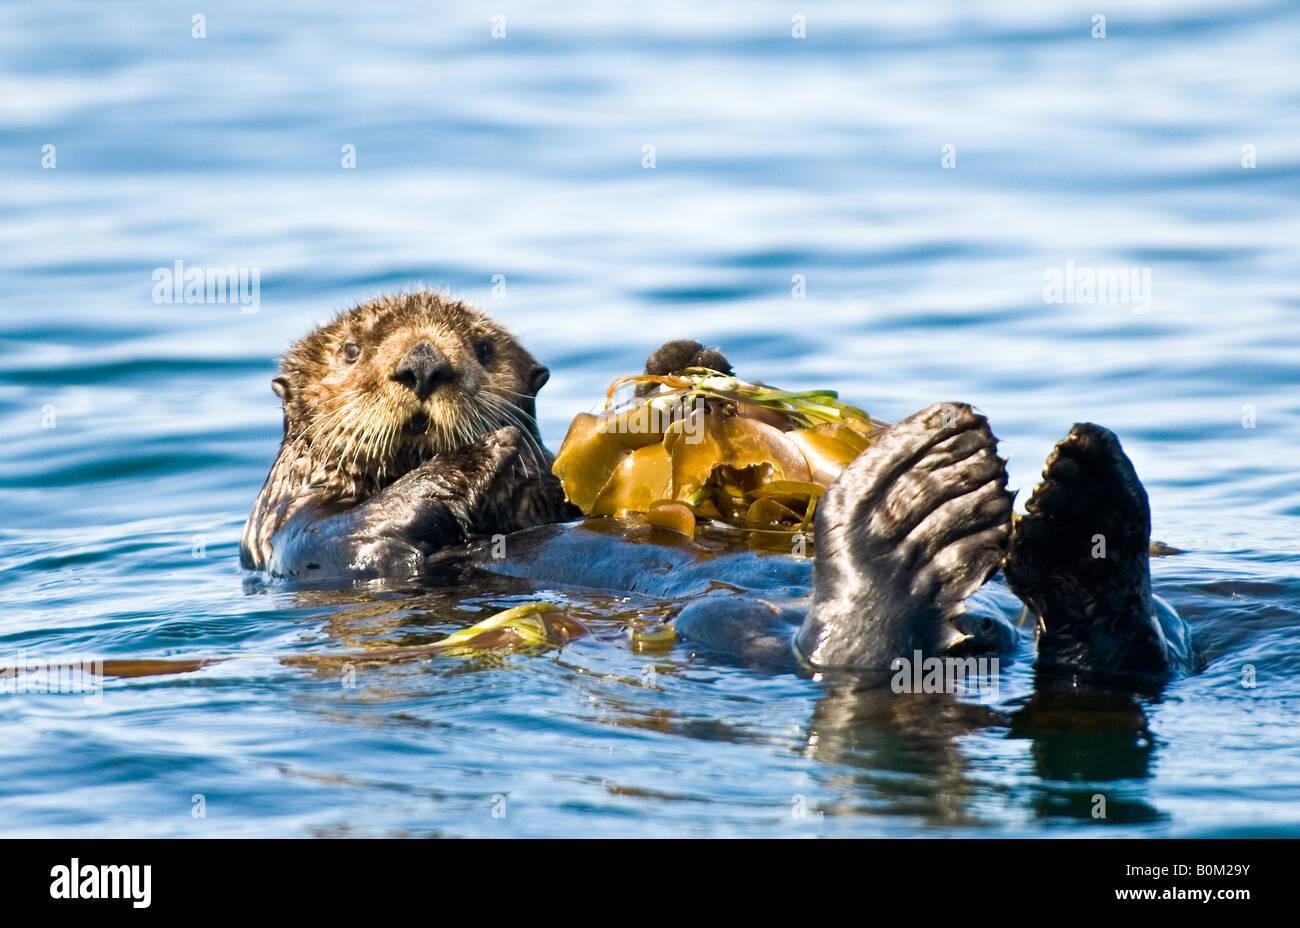 Estados Unidos da América Alasca Sea Otter repousando sobre cama de algas no oceano Imagens de Stock